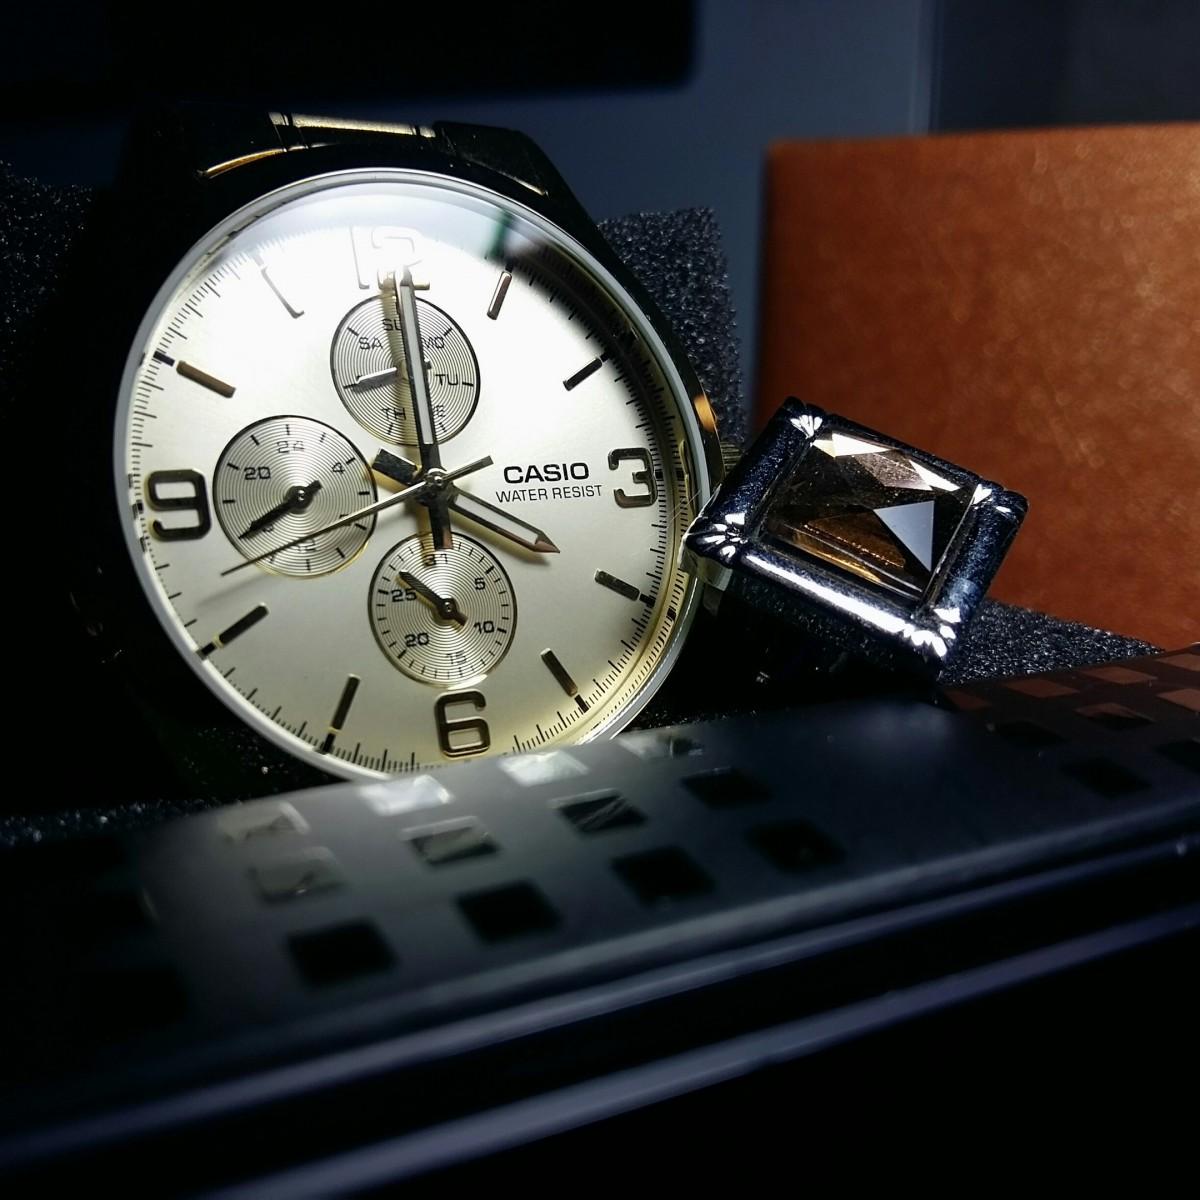 Free Images : clock, Analog watch, watch accessory, fashion